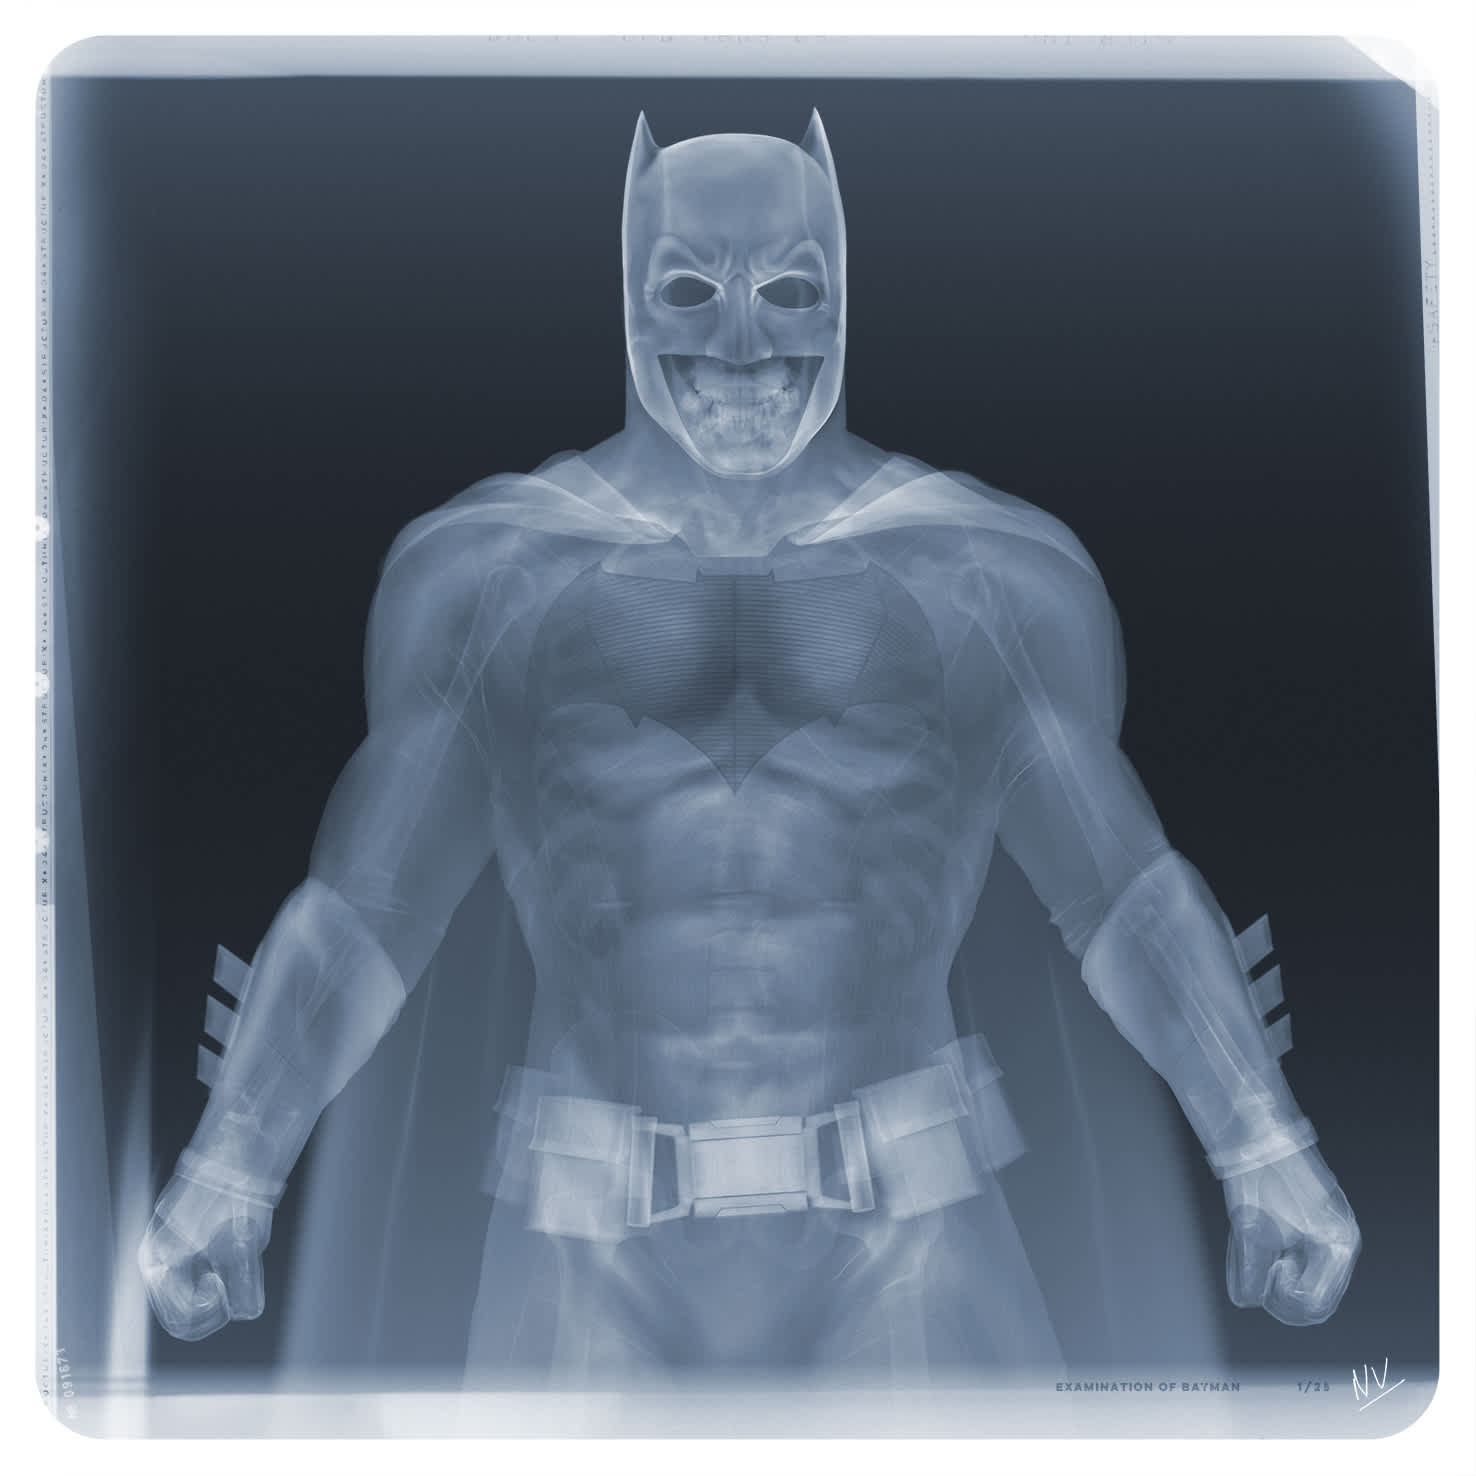 Nick Veasey, Examination of Batman, 2020